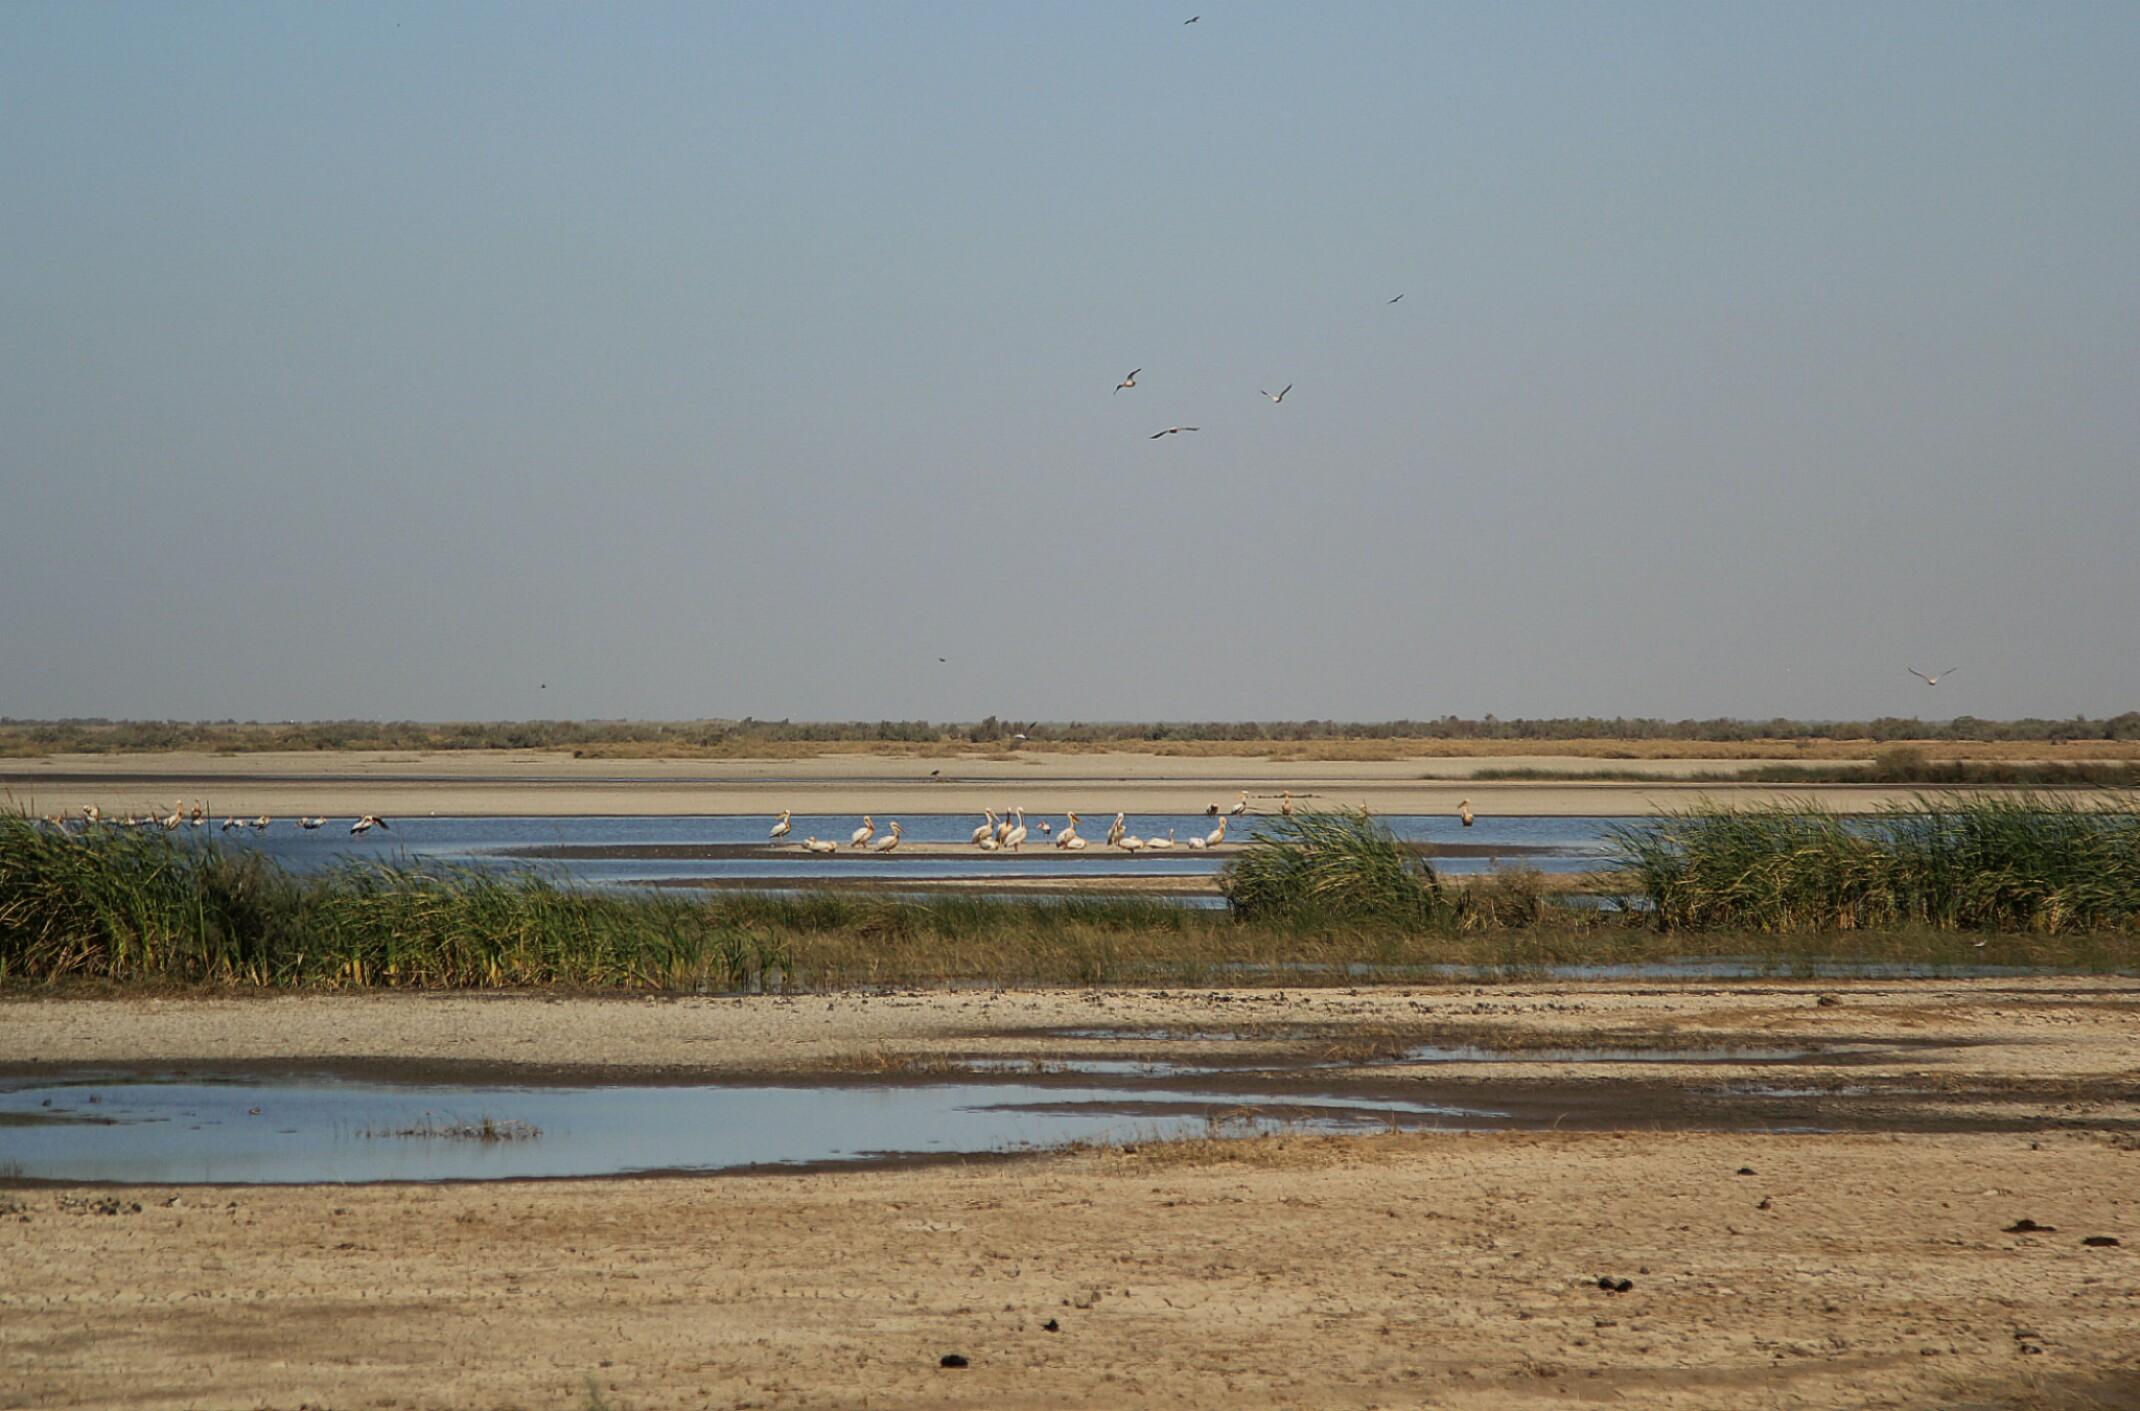 Park Narodowy Banc d'Arguin. Mauretania